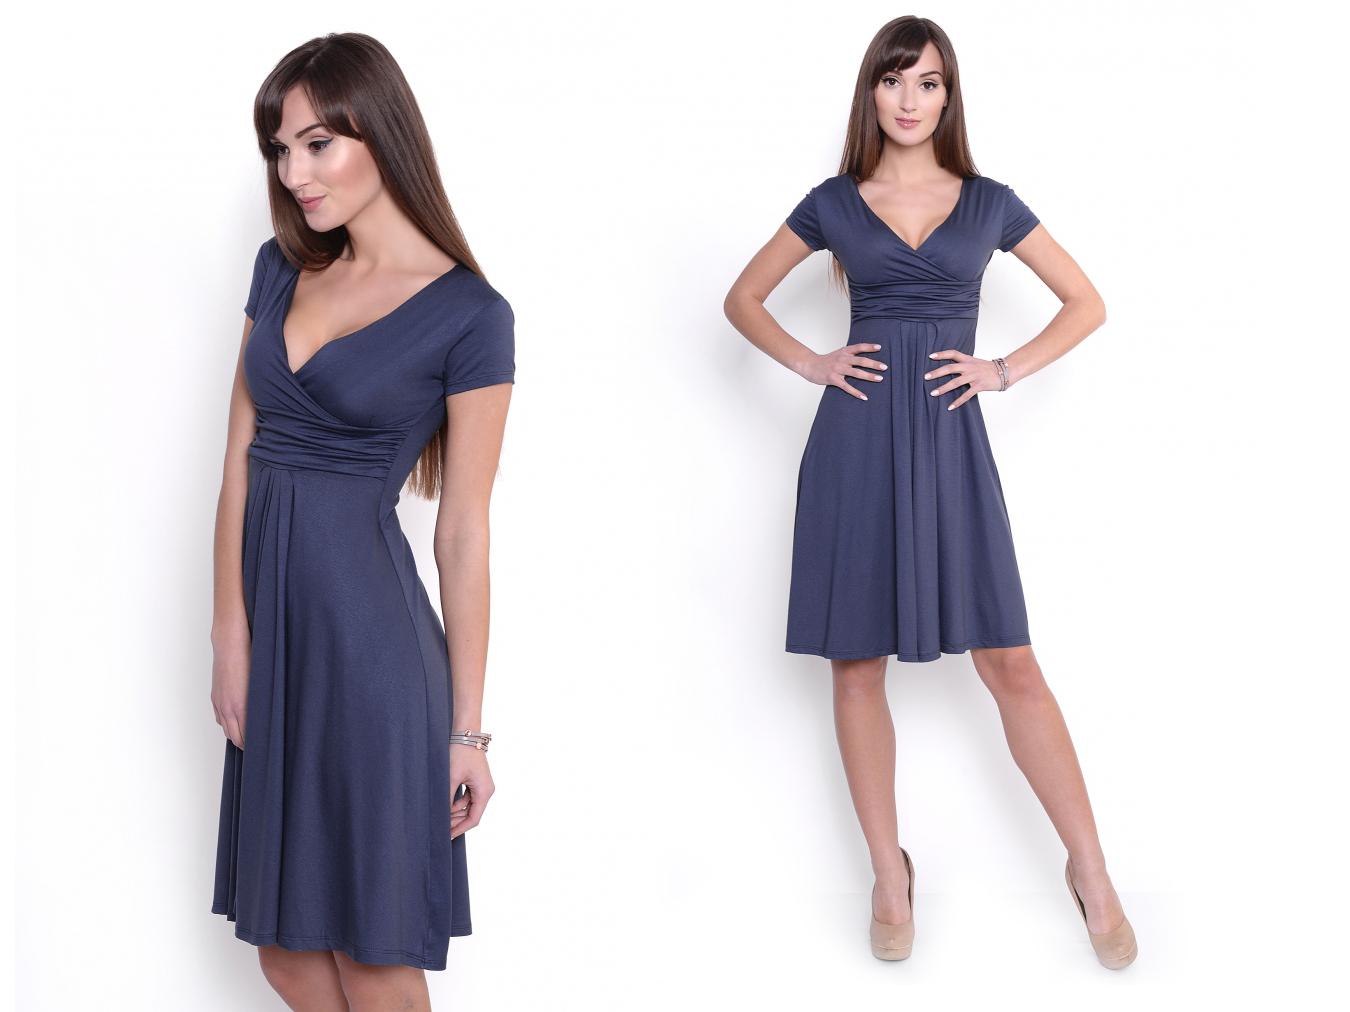 b729396d03 Cudowna Sukienka Kopertowa Graf 18416 S M - 7188478134 - oficjalne ...